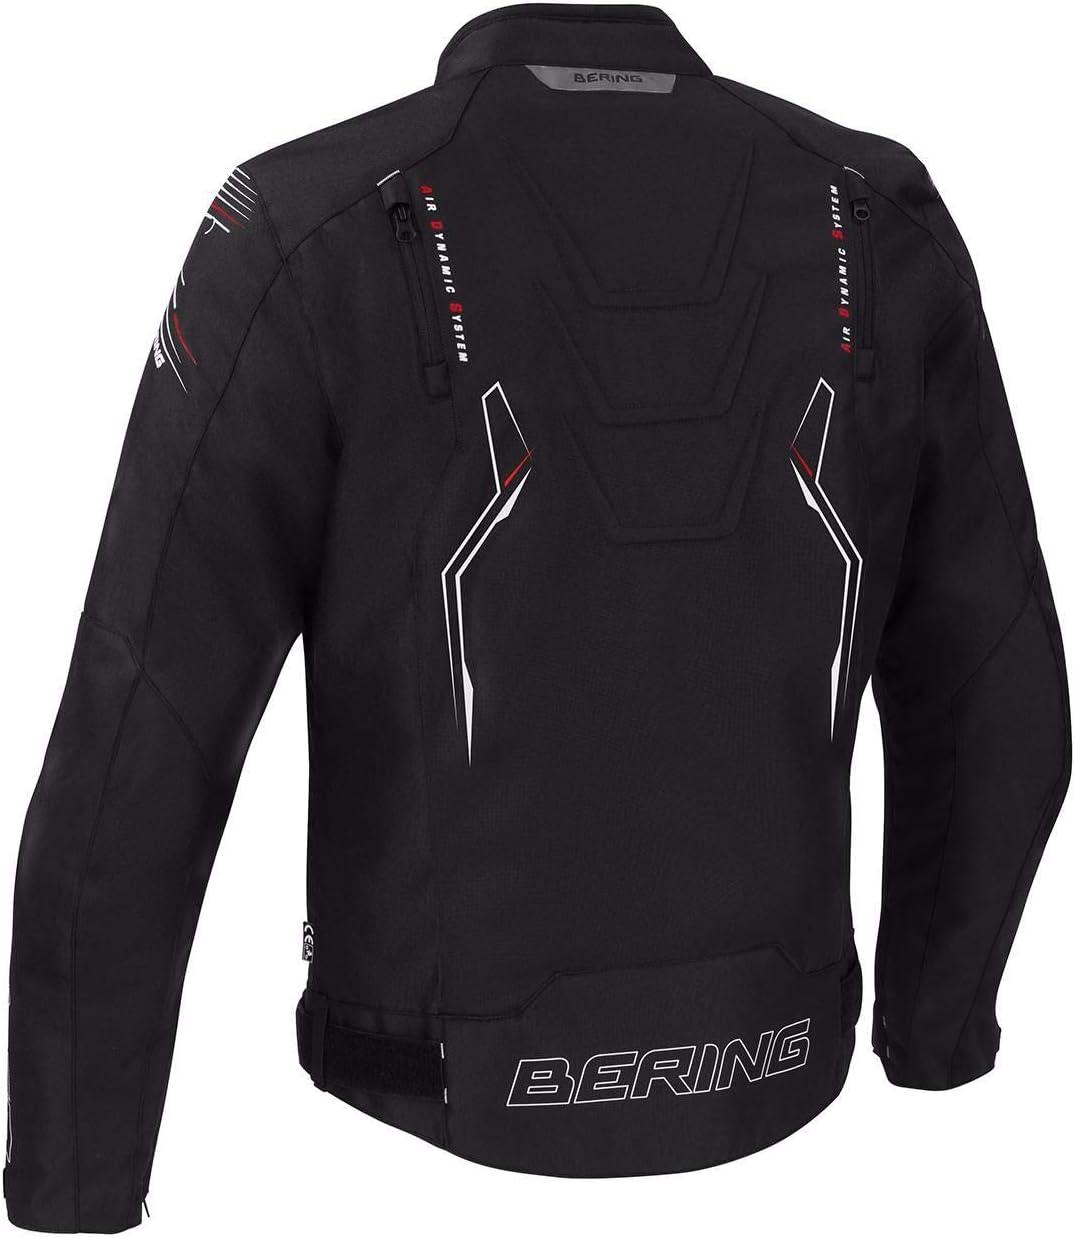 Bering Softshell/ /Chaqueta Moto Racing gris rojo blanco